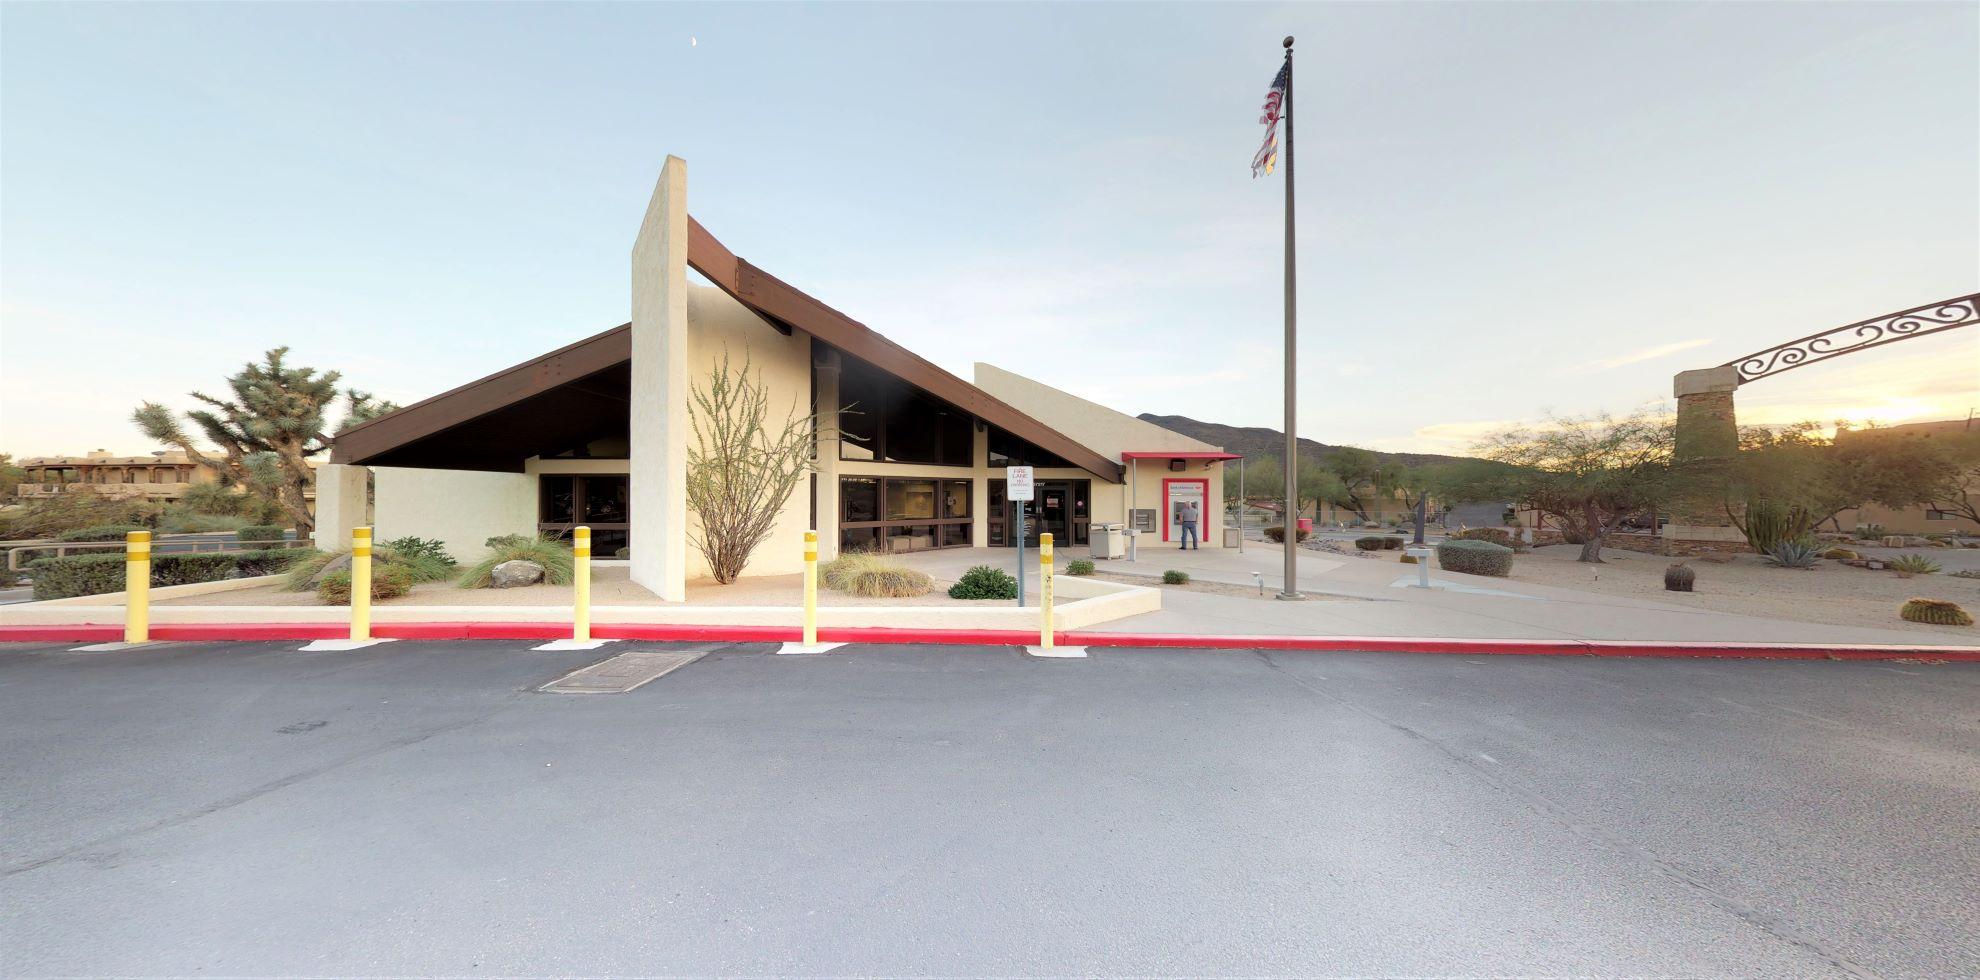 Bank of America financial center with walk-up ATM | 37217 N Tom Darlington Dr, Carefree, AZ 85377